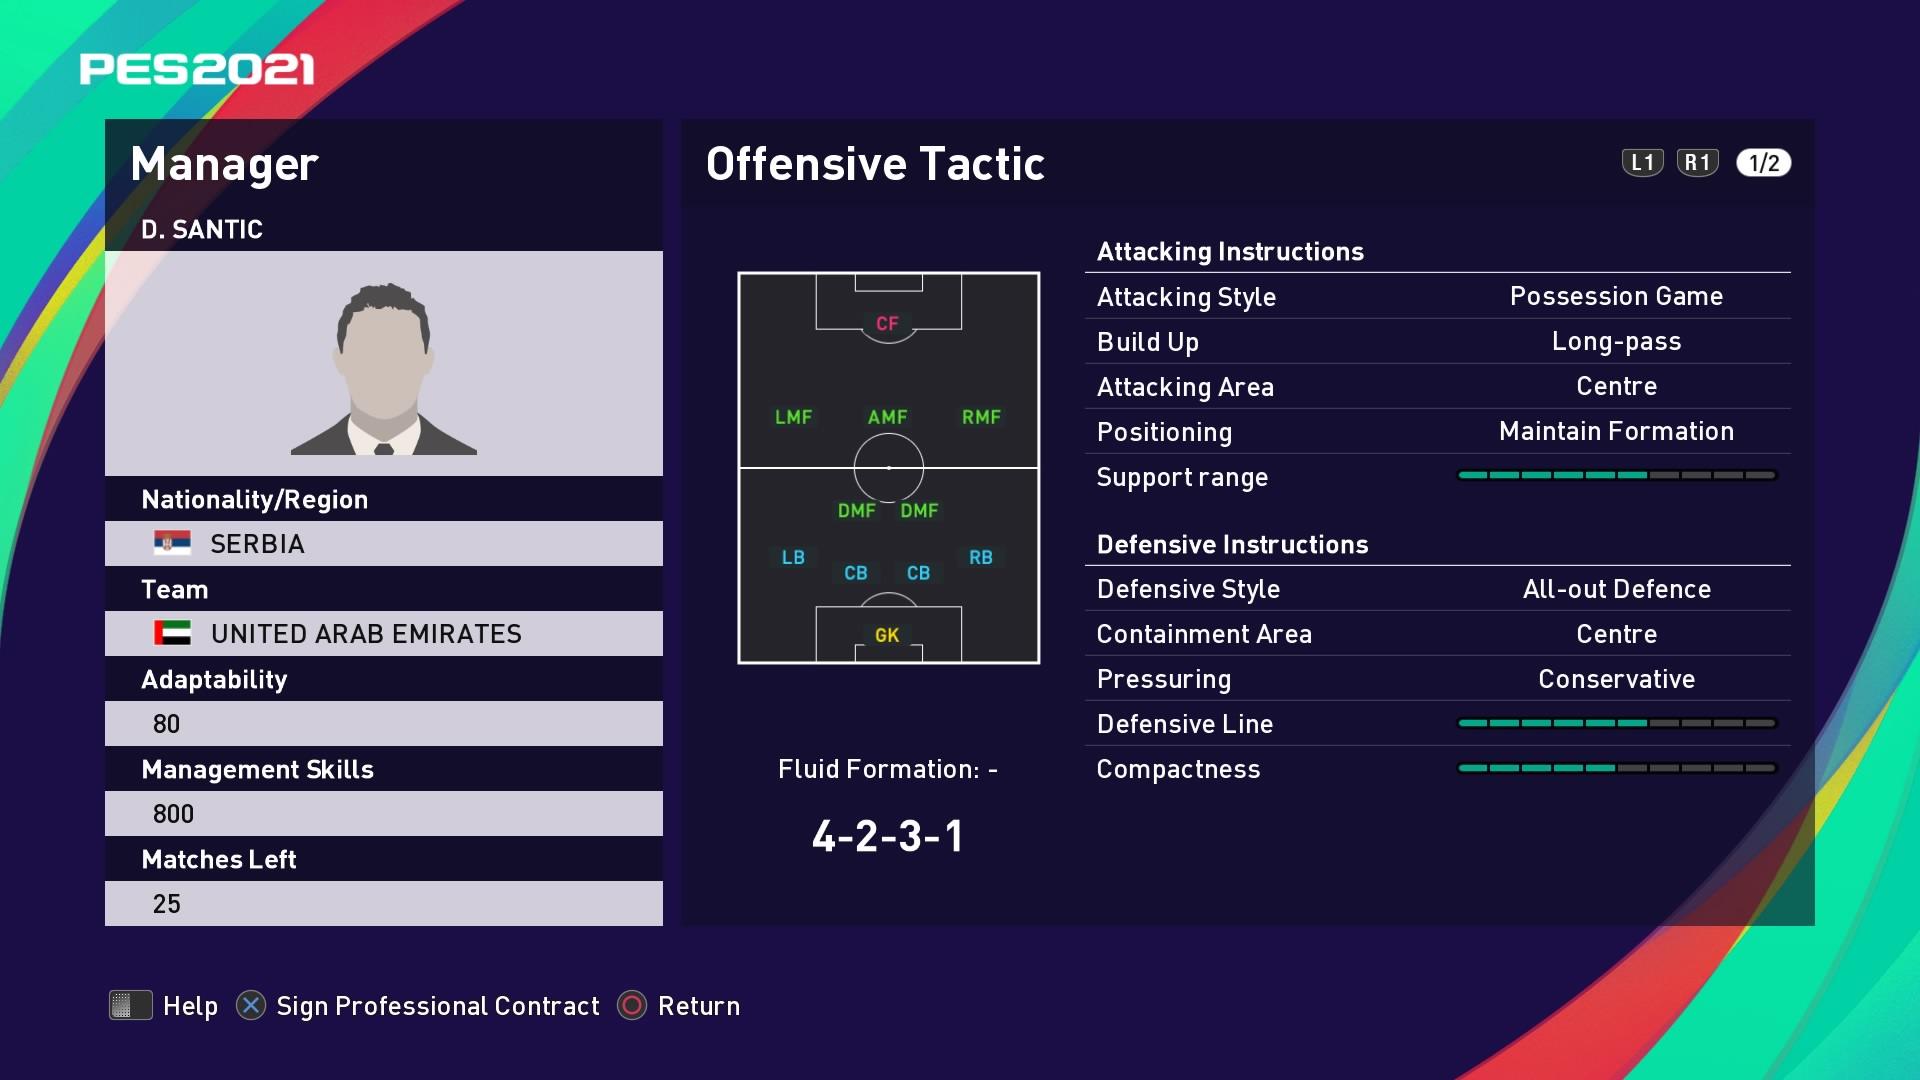 D. Santic (Ivan Jovanović) Offensive Tactic in PES 2021 myClub